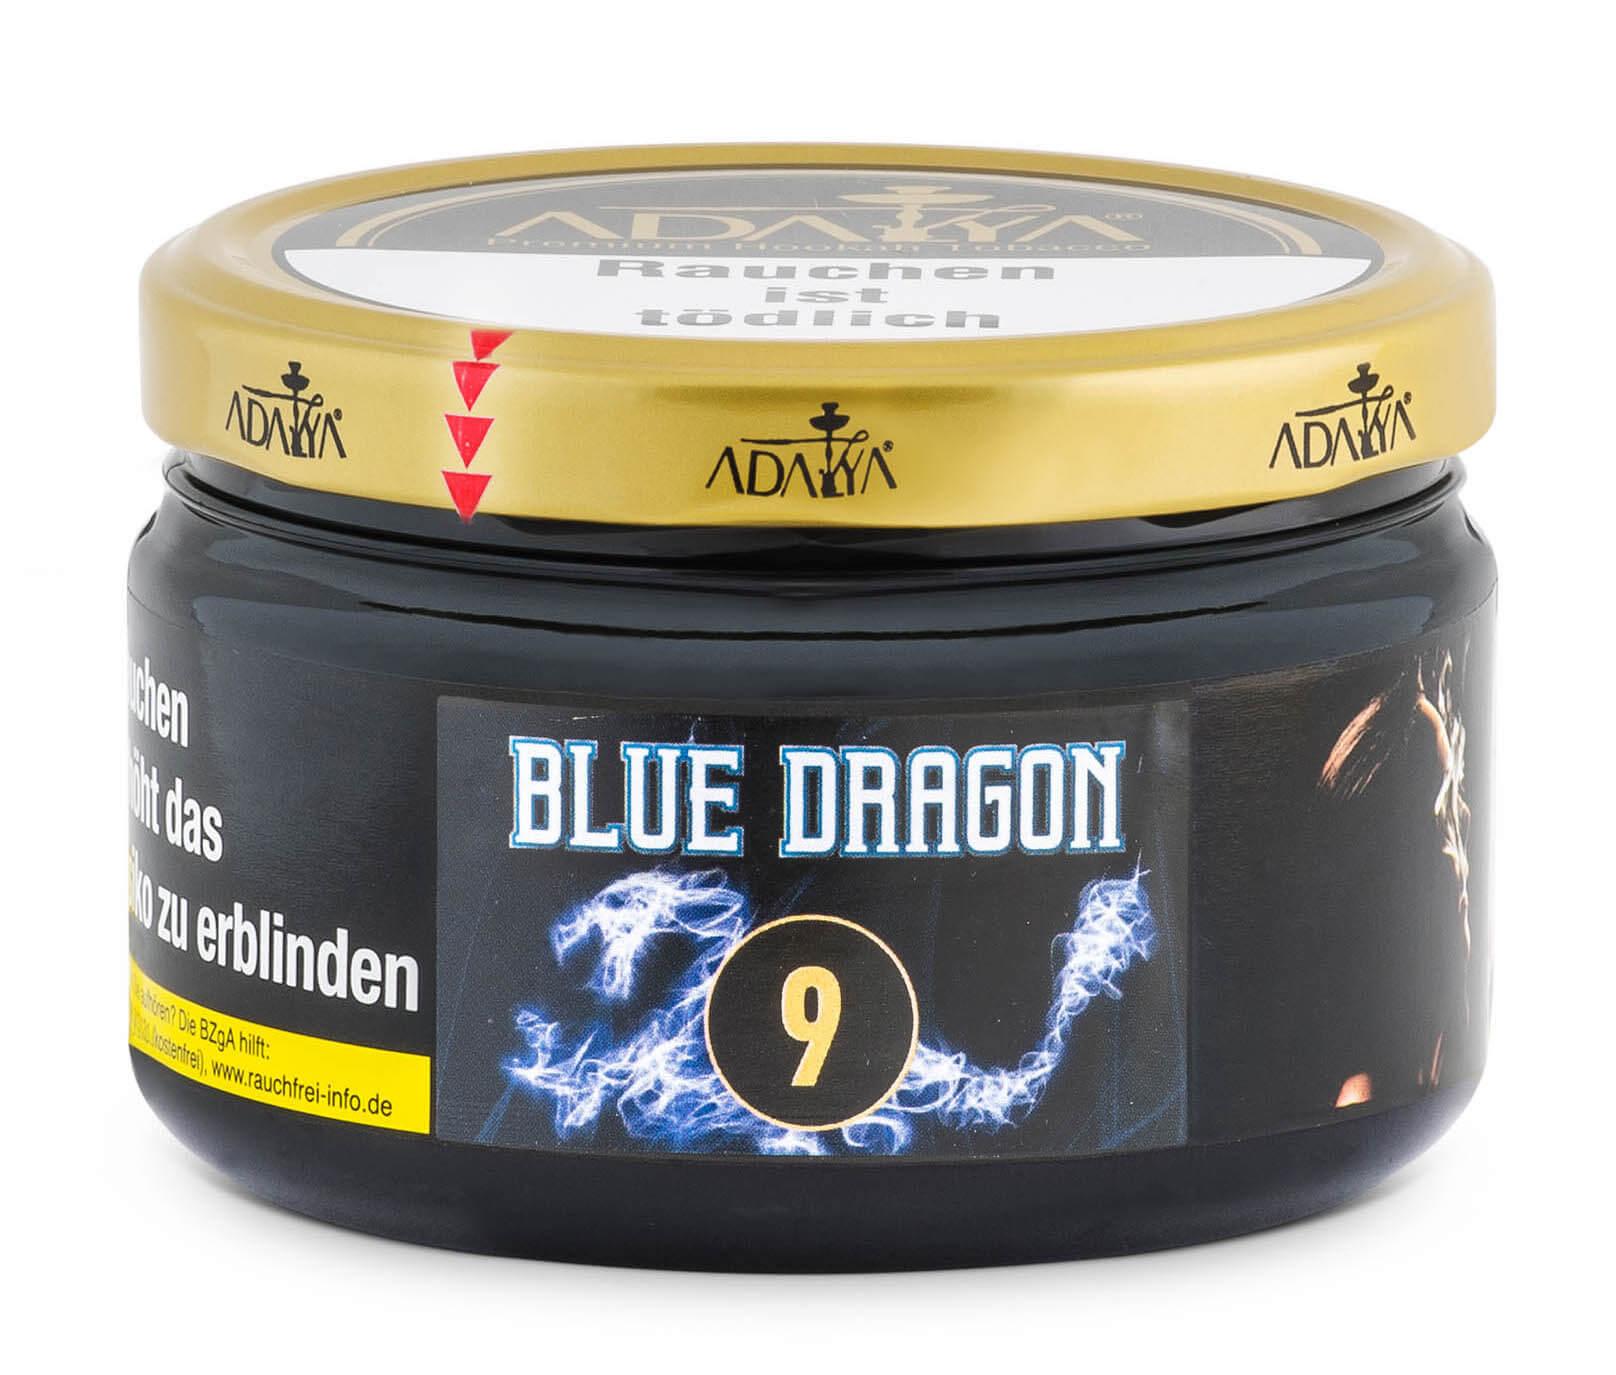 Adalya Tabak Blue Dragon #9 200g